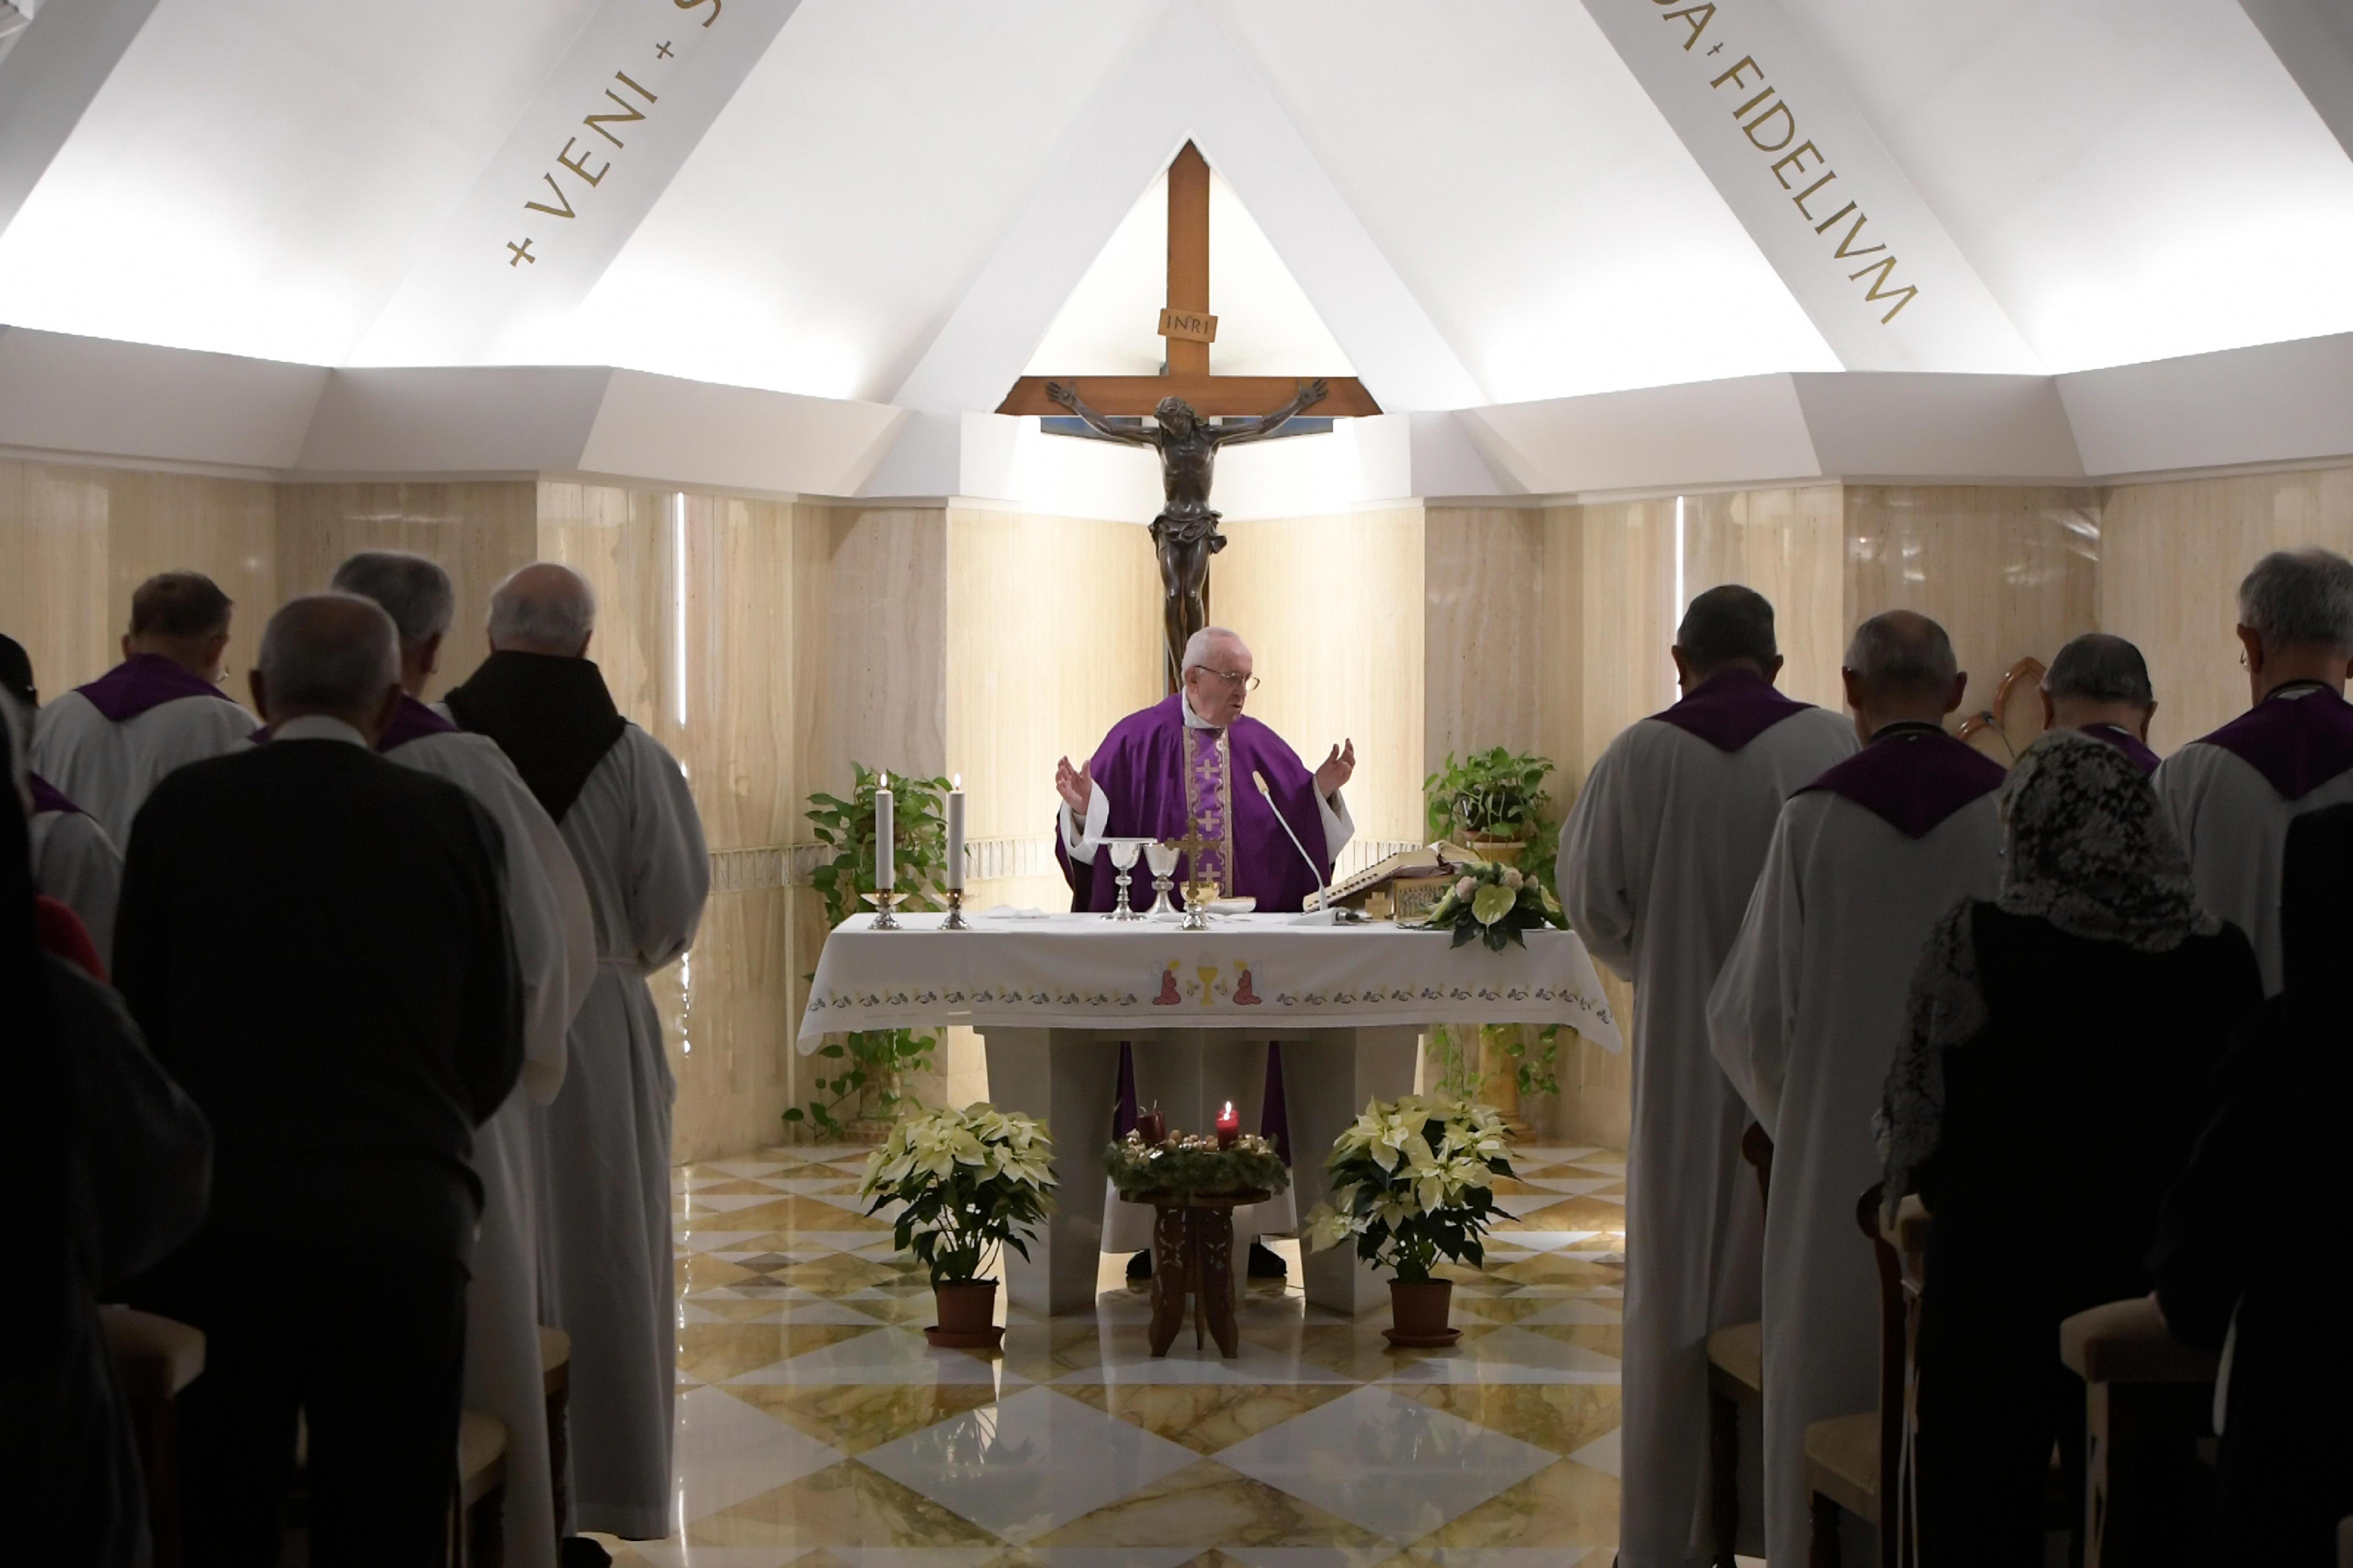 Misa en Santa Marta, 11 dic. 2018 © Vatican Media